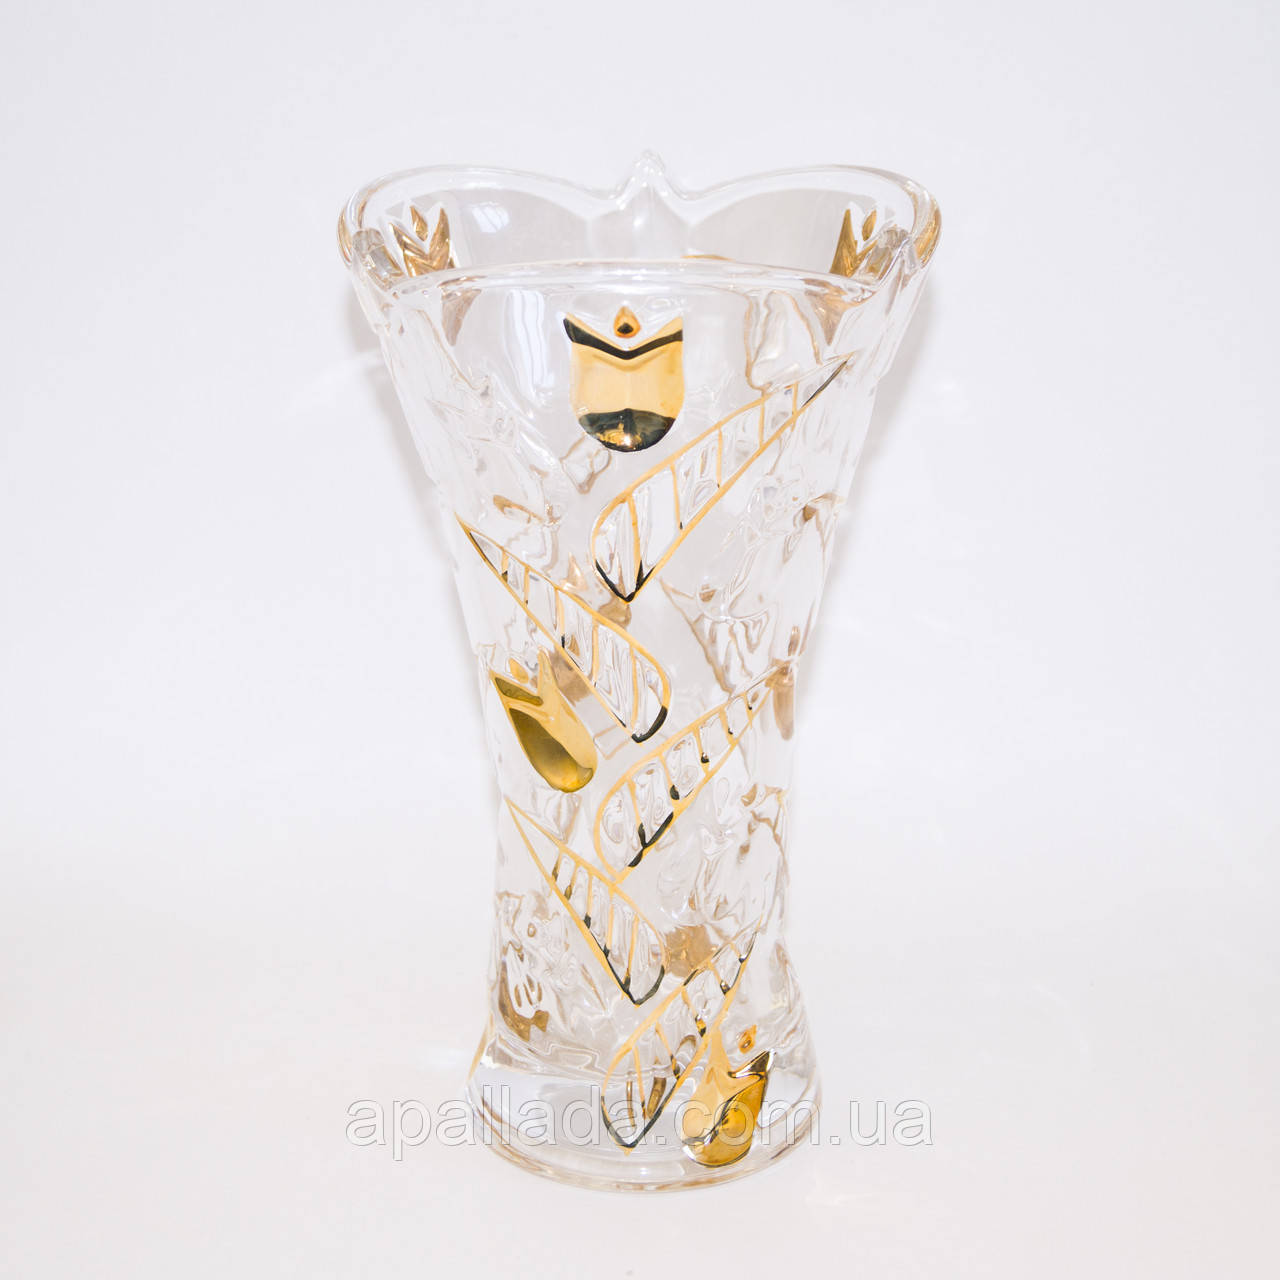 Ваза, Тюльпан 24,5 см